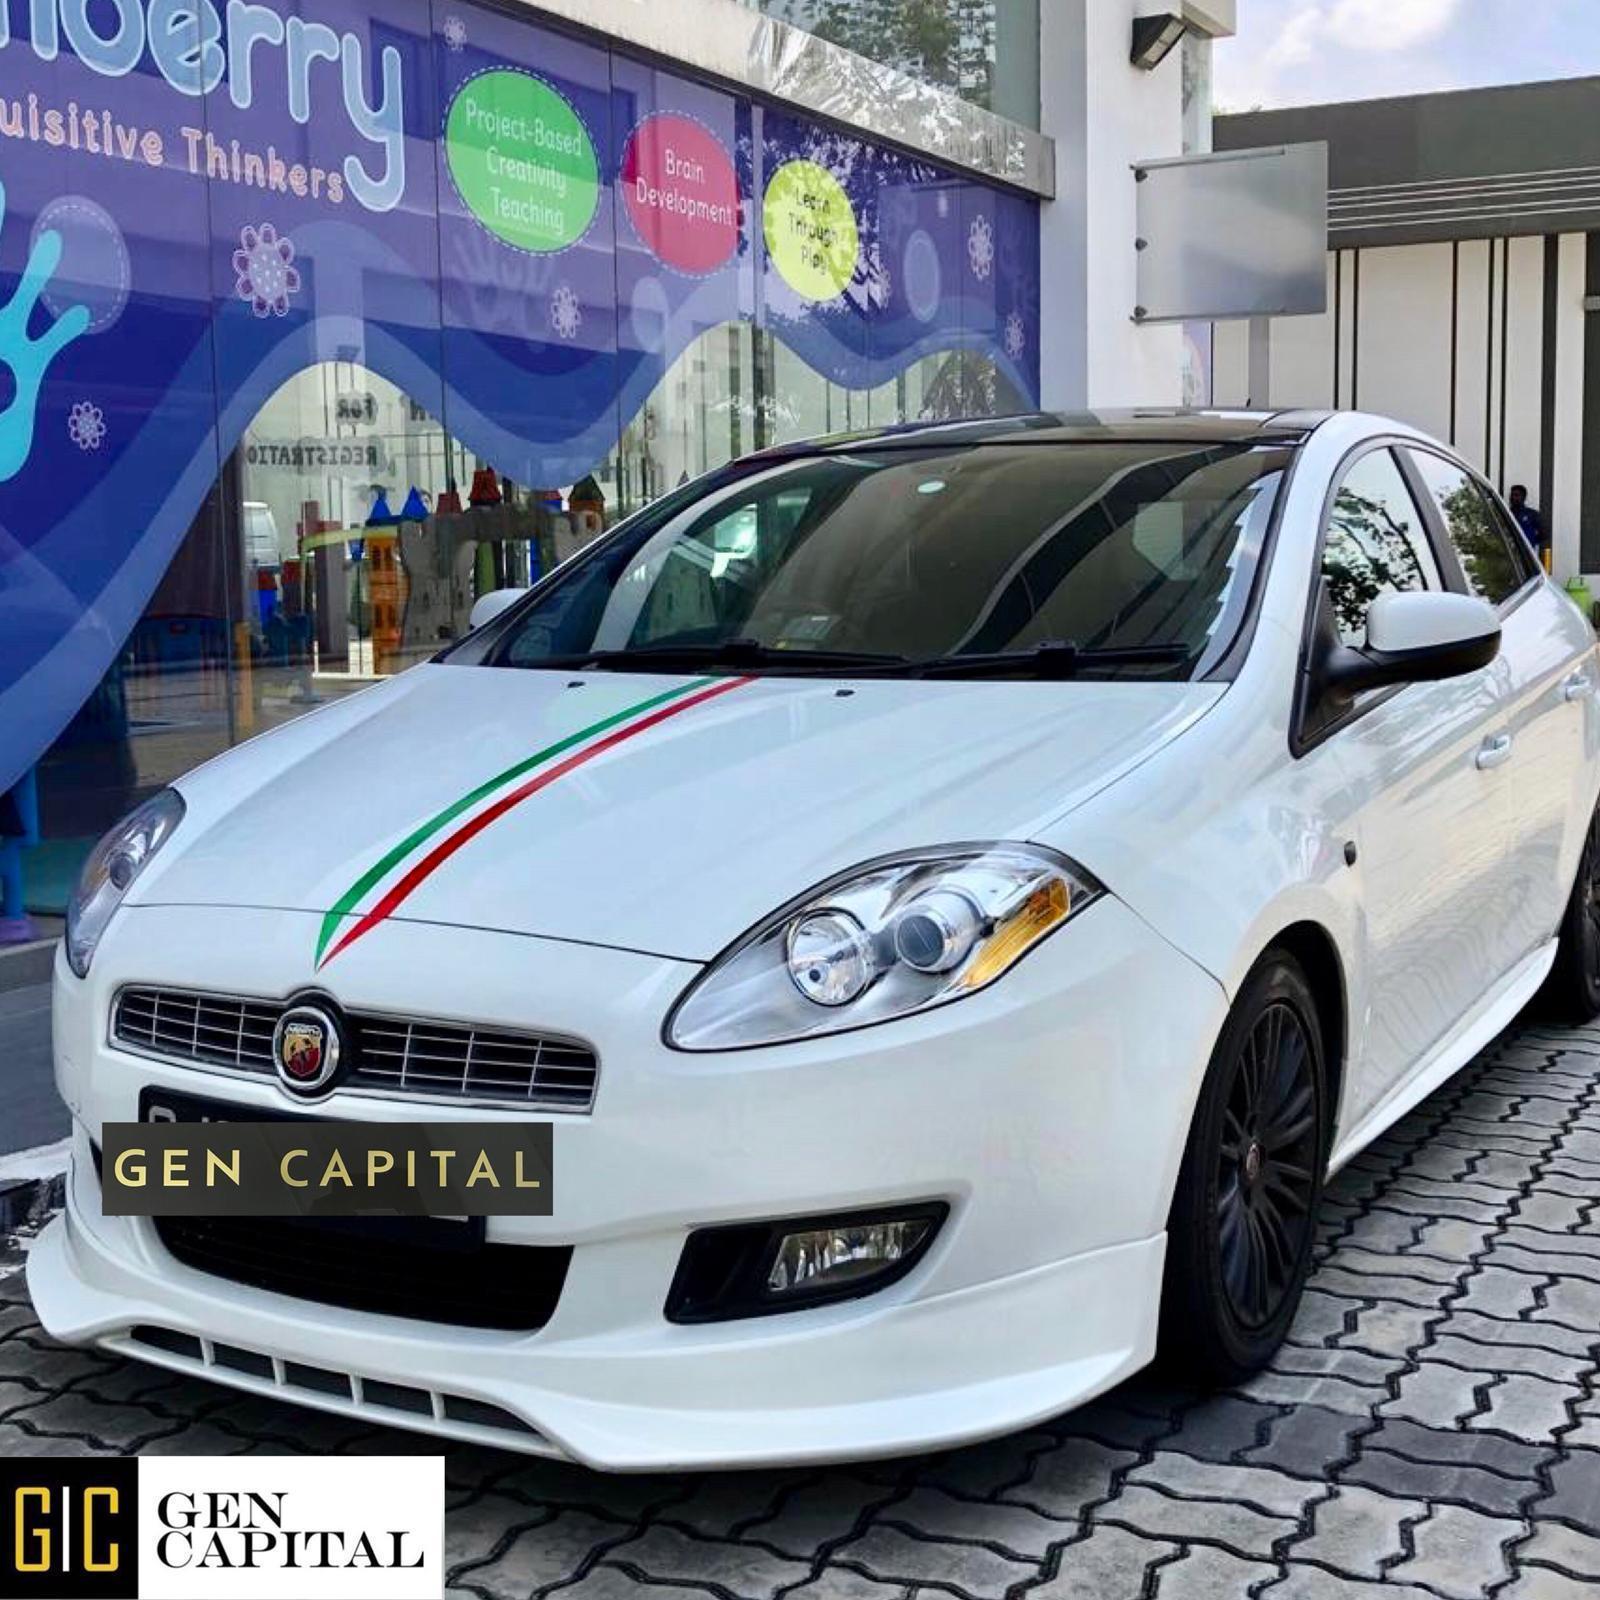 Fiat Bravo 1.4A T-Jet turbo Fuel Efficient & Best In The Market